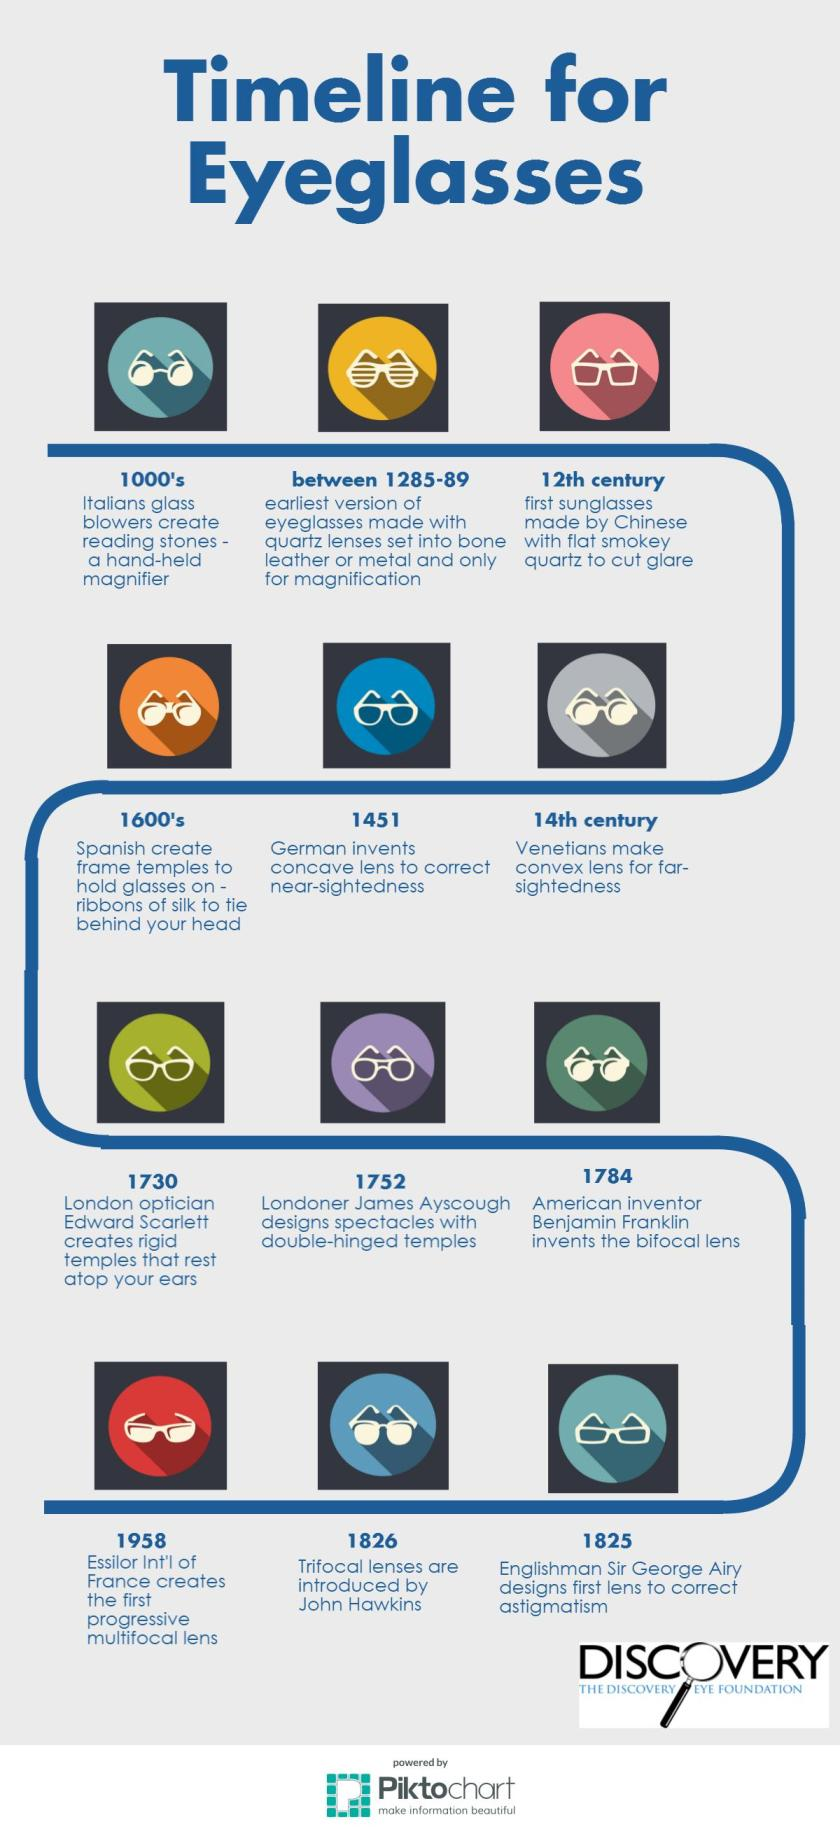 Eyeglasses timeline